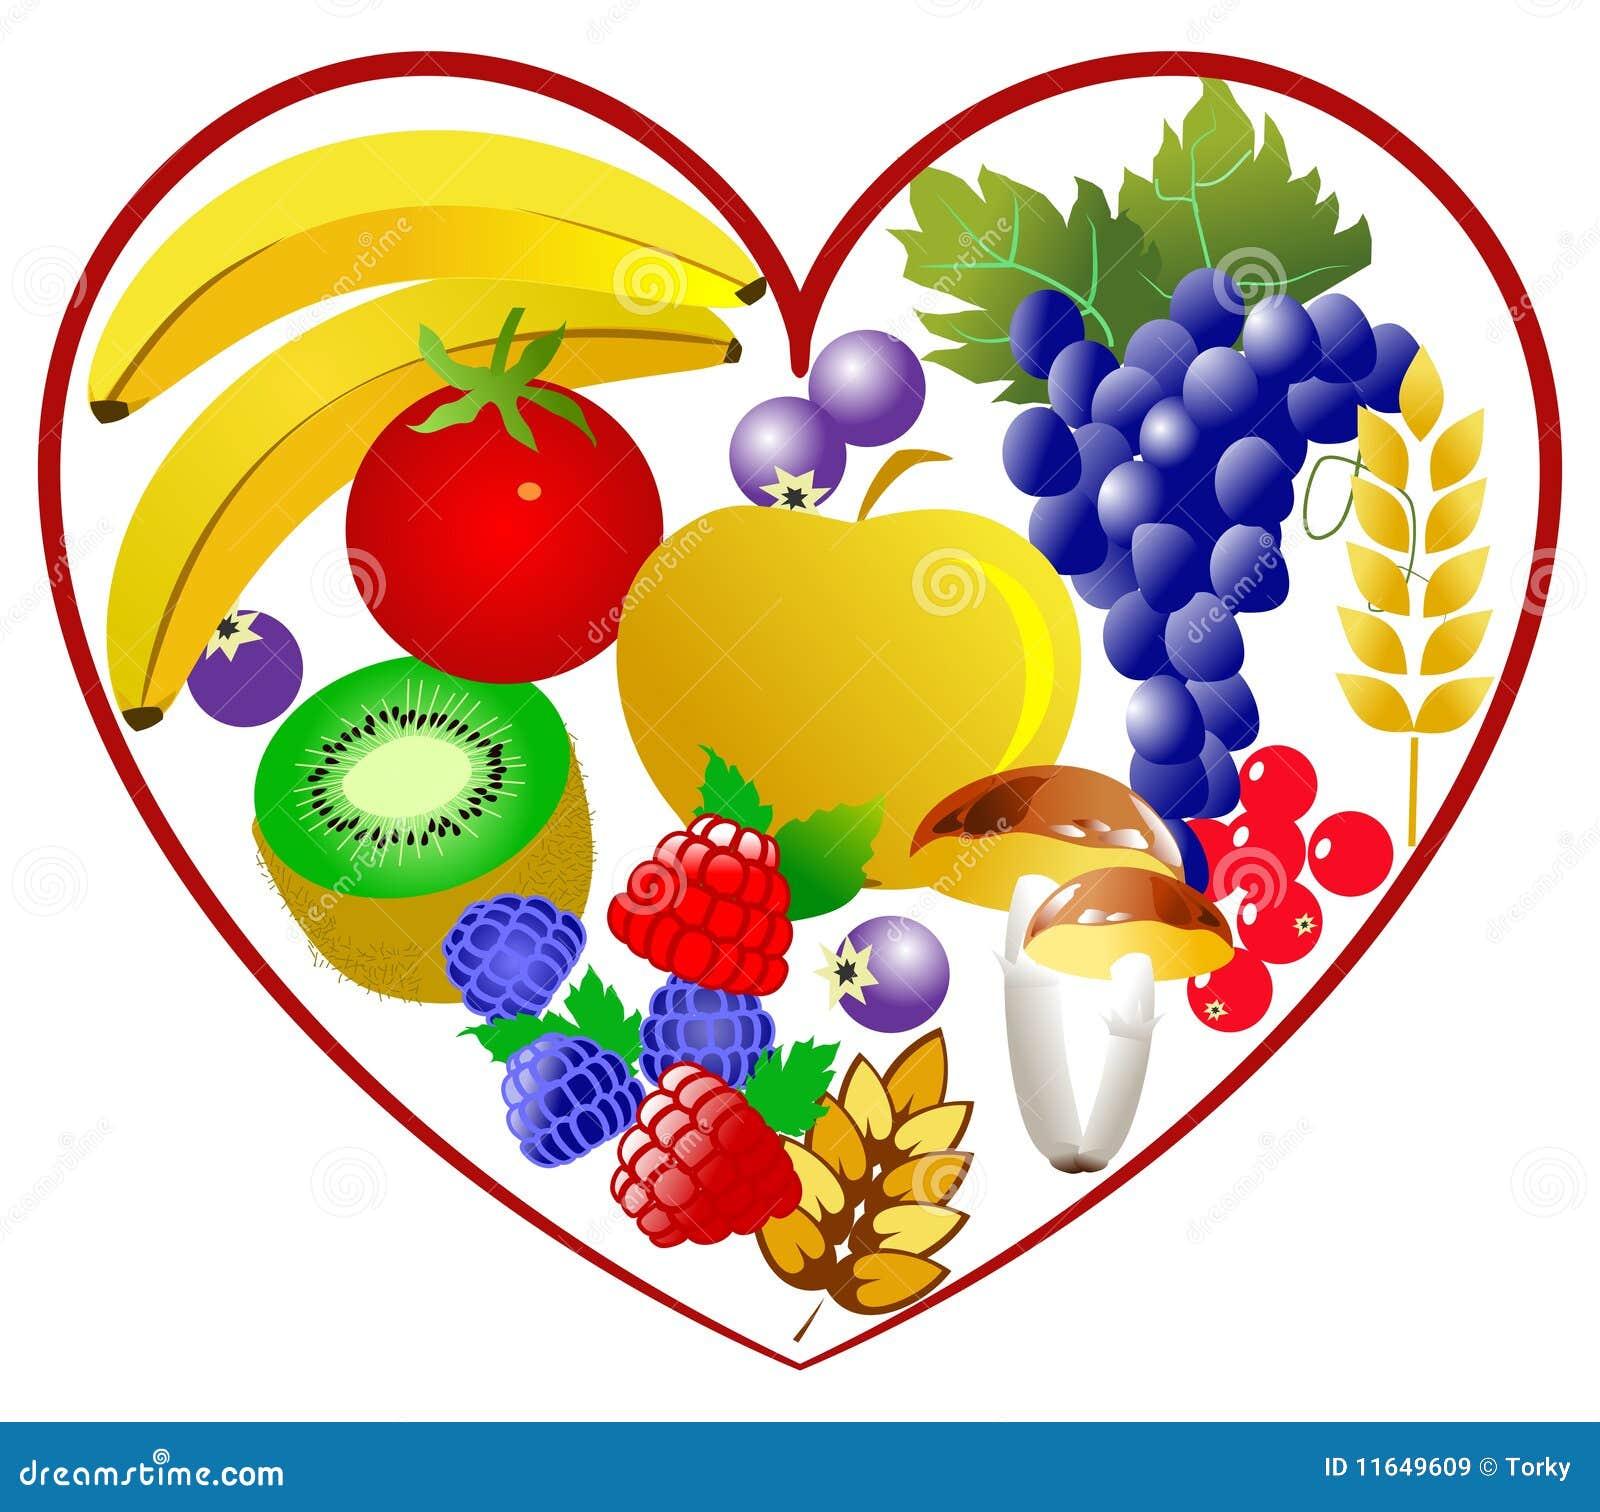 bio food  healthy heart stock vector illustration of healthy eating clip art high choleterol healthy eating clipart borders